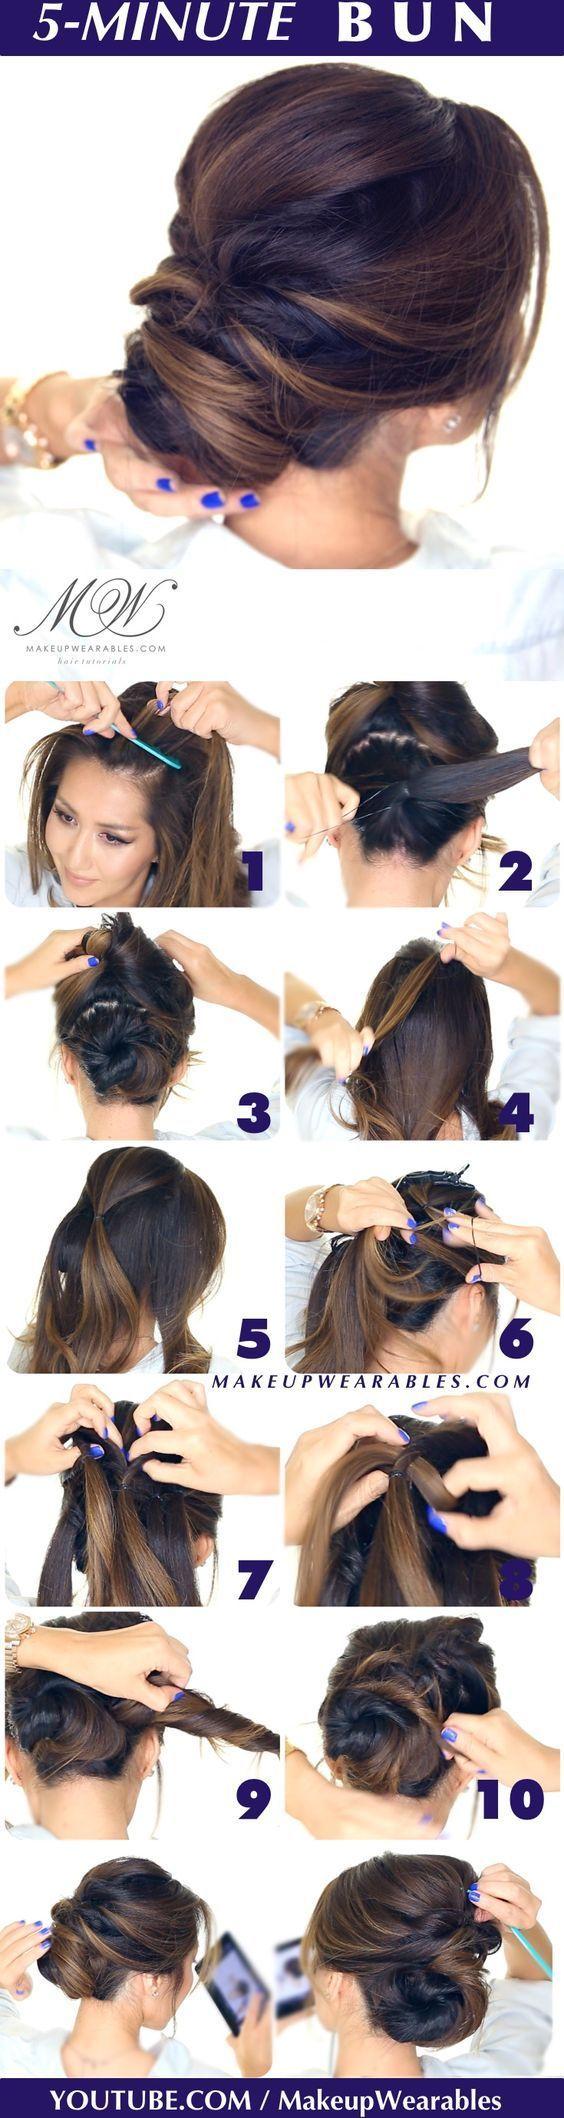 Miraculous 1000 Ideas About Bun Hairstyles On Pinterest Braided Bun Short Hairstyles Gunalazisus